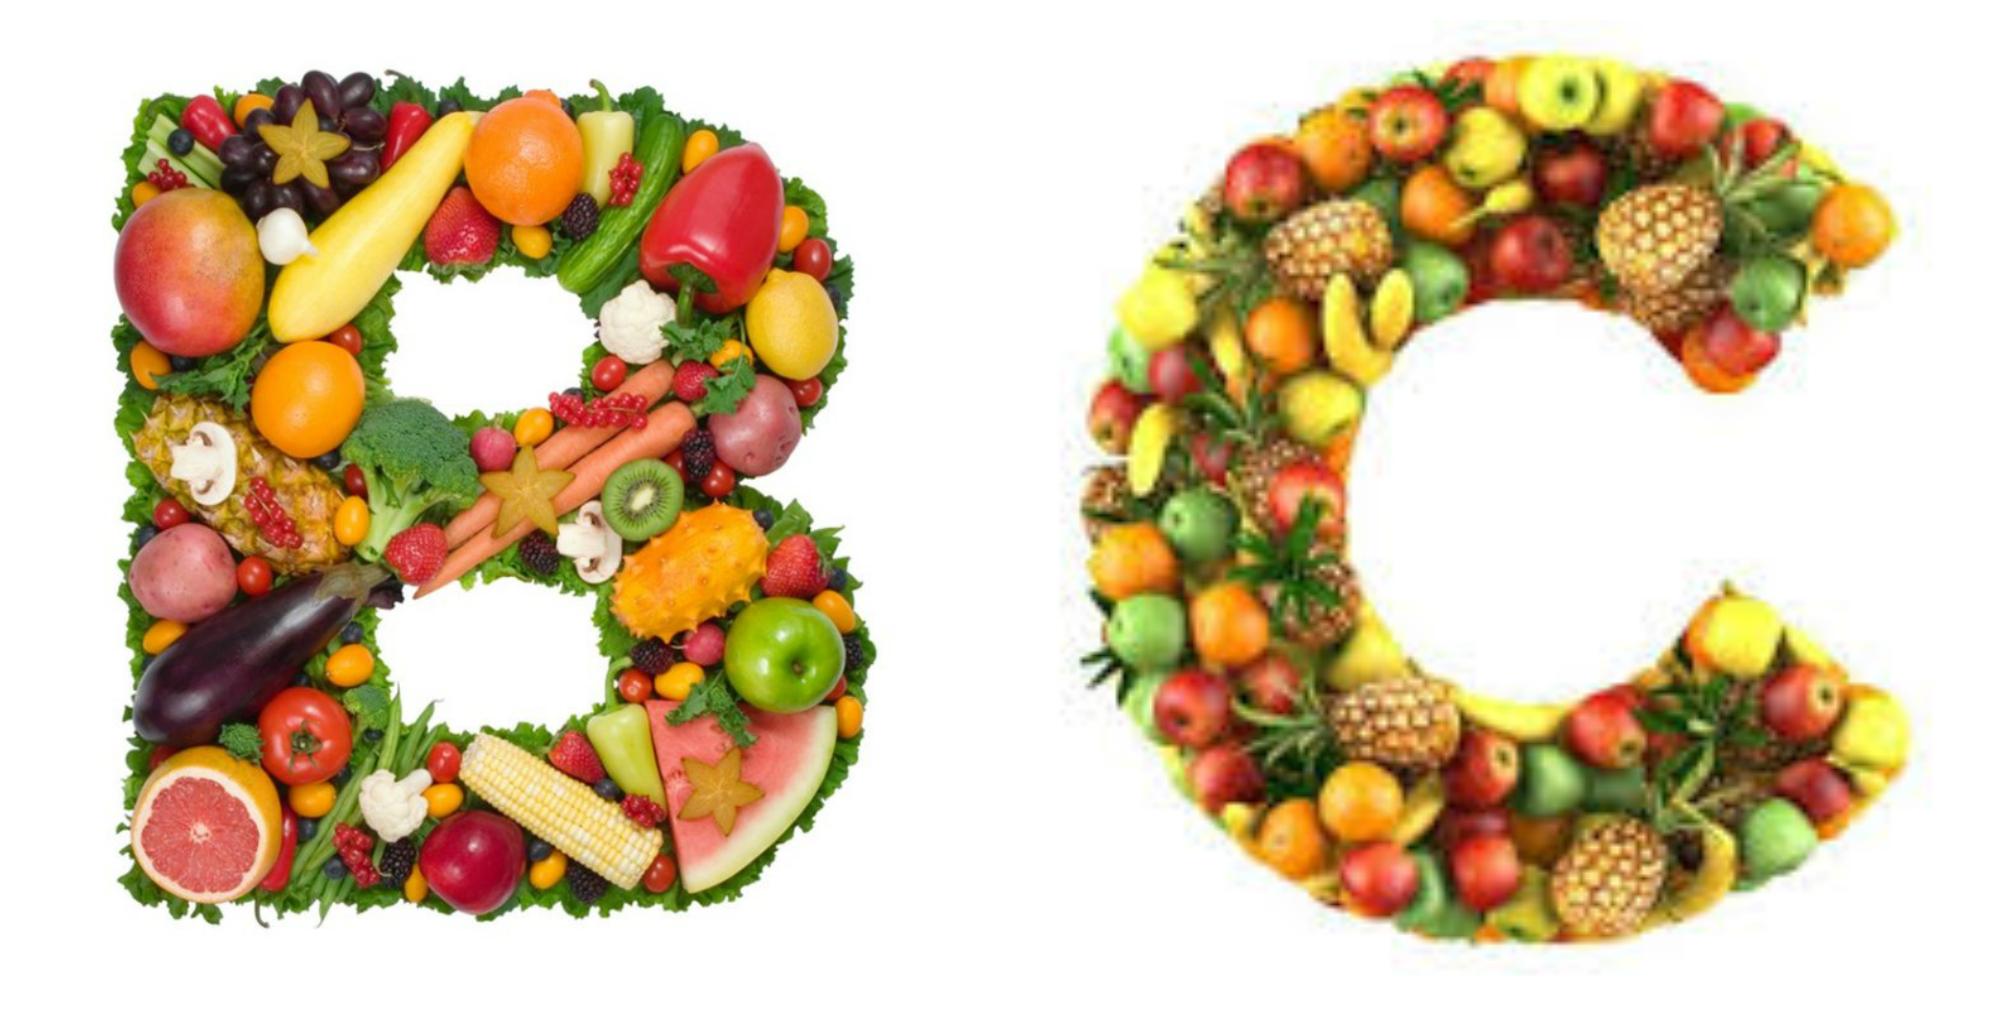 Картинка витамины группы